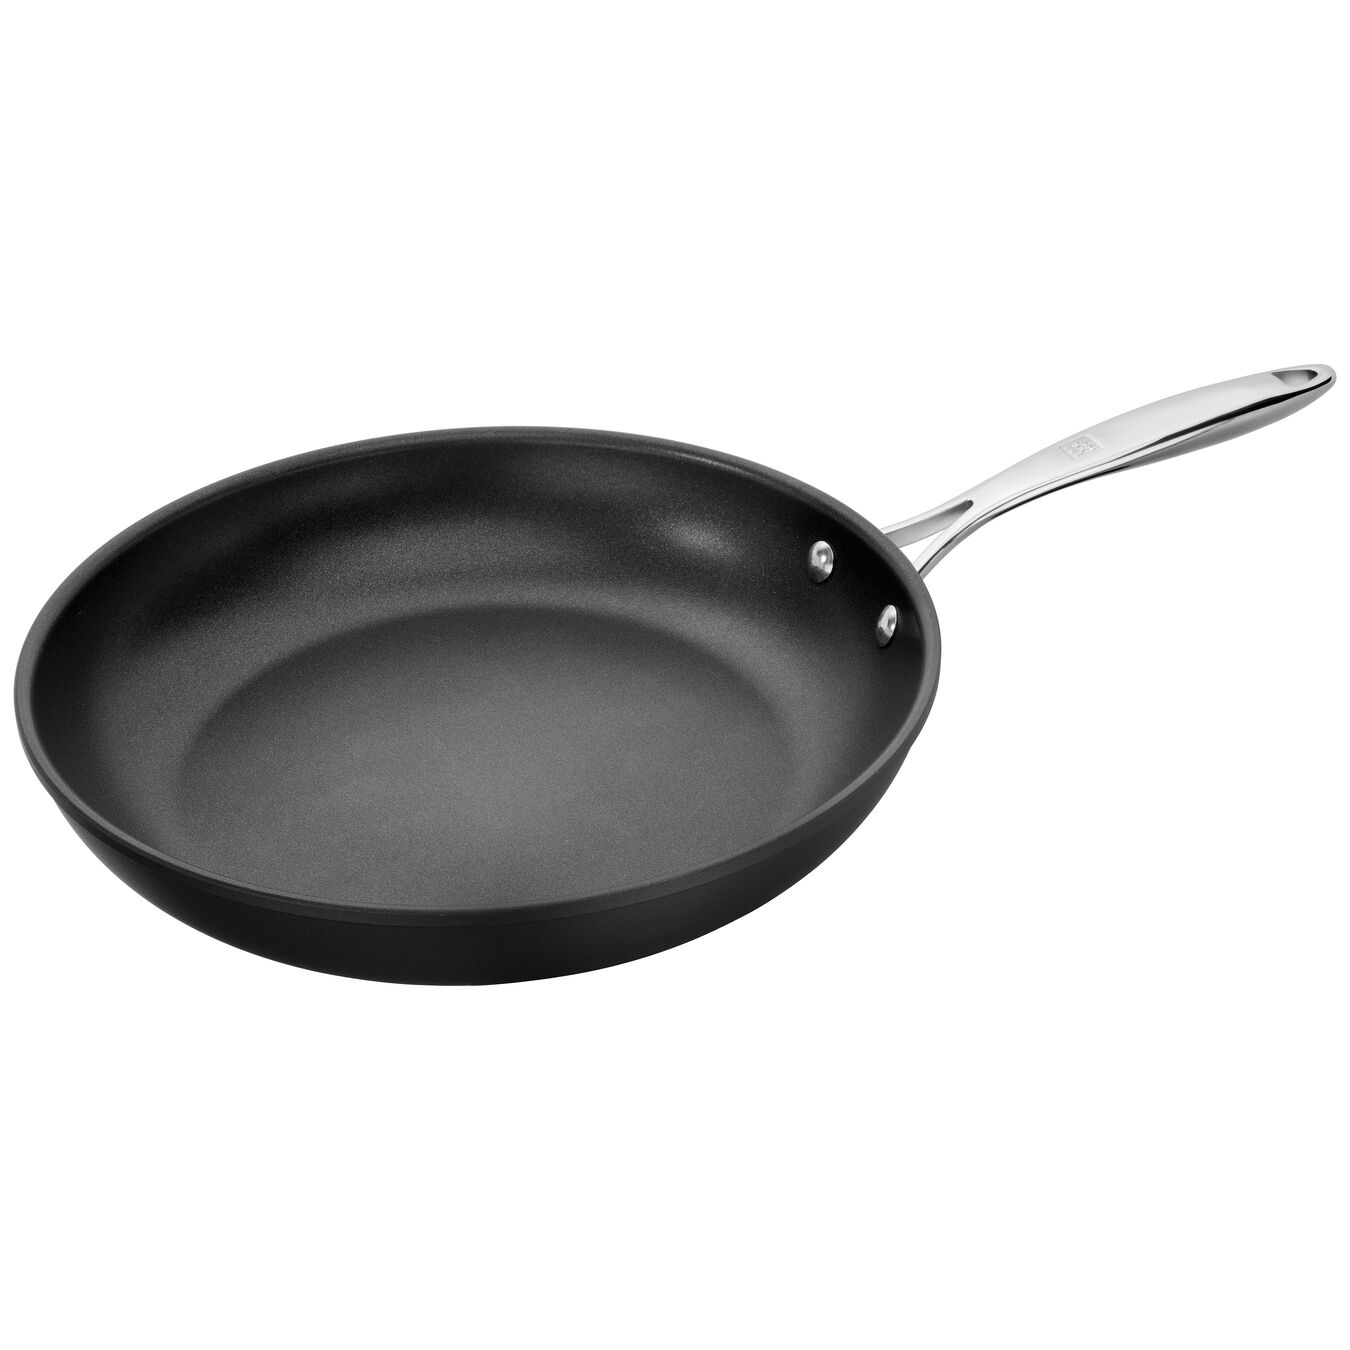 30 cm / 12 inch Aluminum Frying pan,,large 1